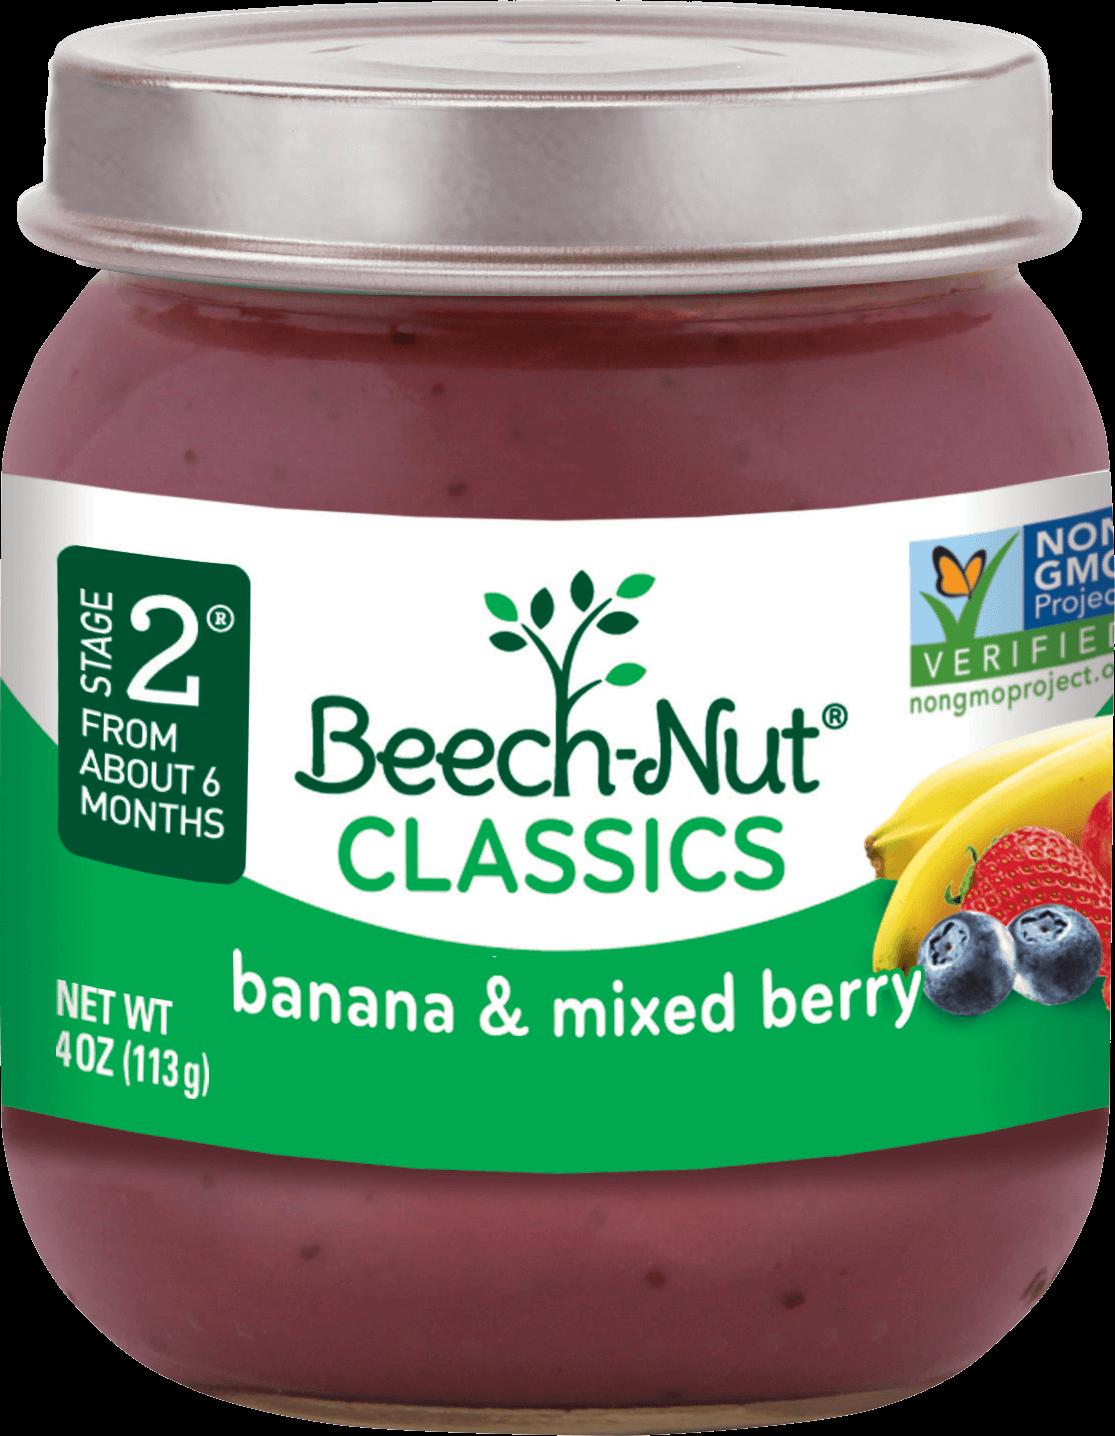 Beechnut Classics Baby Food Ingredients